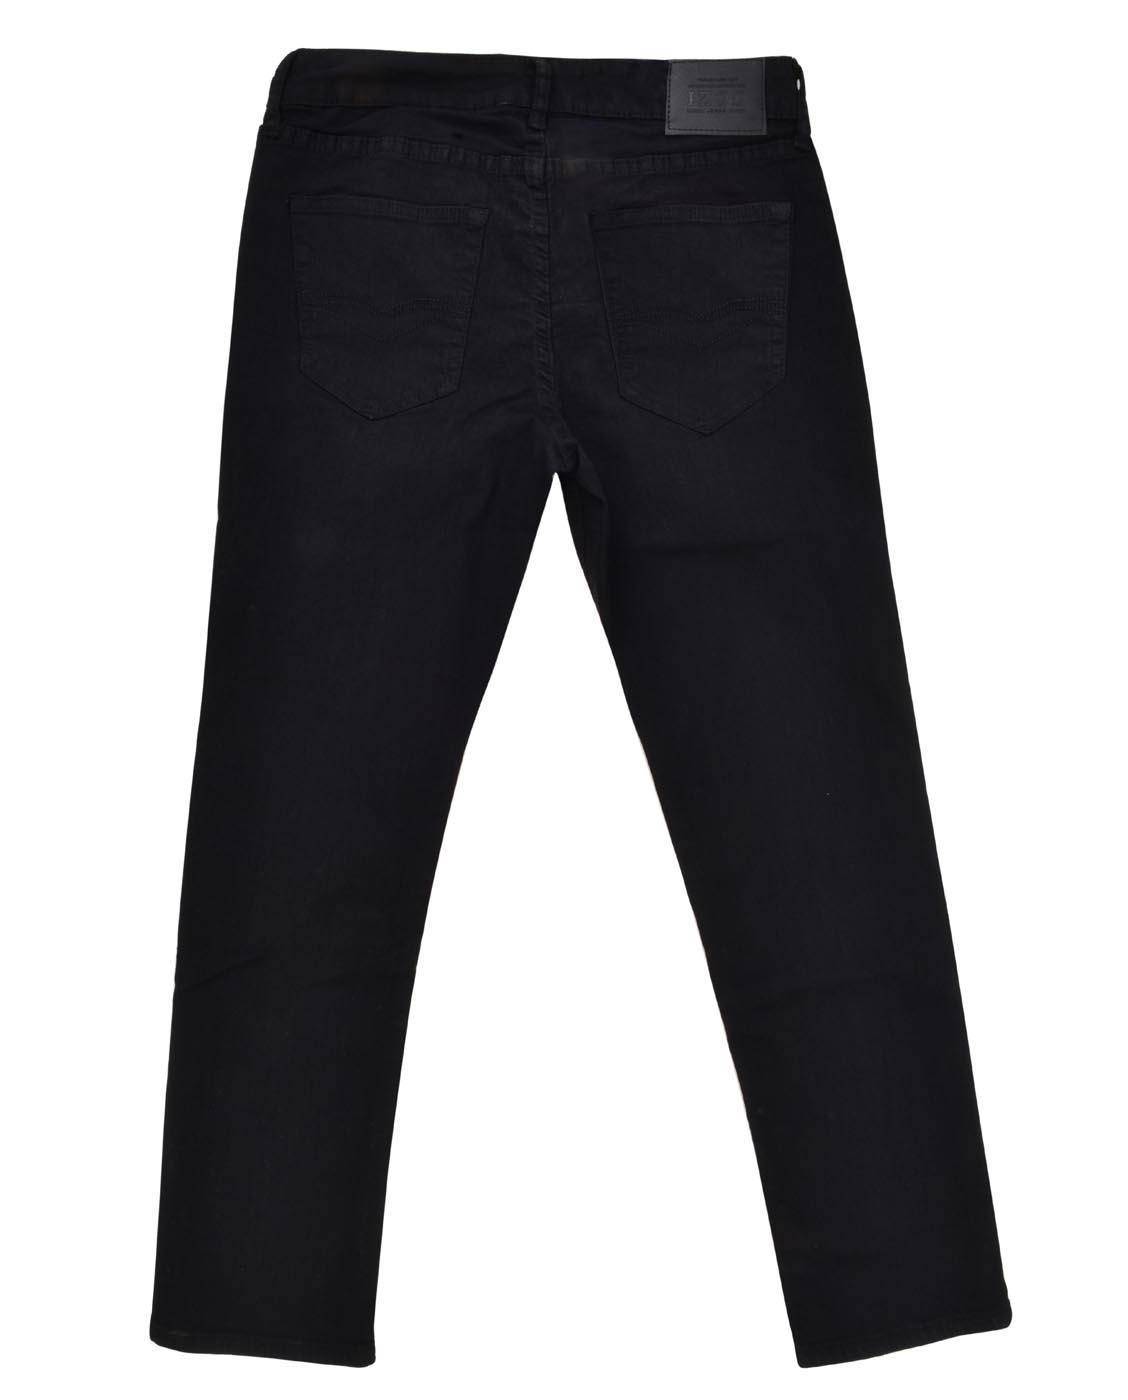 b805b9c15a796 Details about Izod Men's Comfort Stretch Slim Straight Fit Pants Jeans  I38JN65D